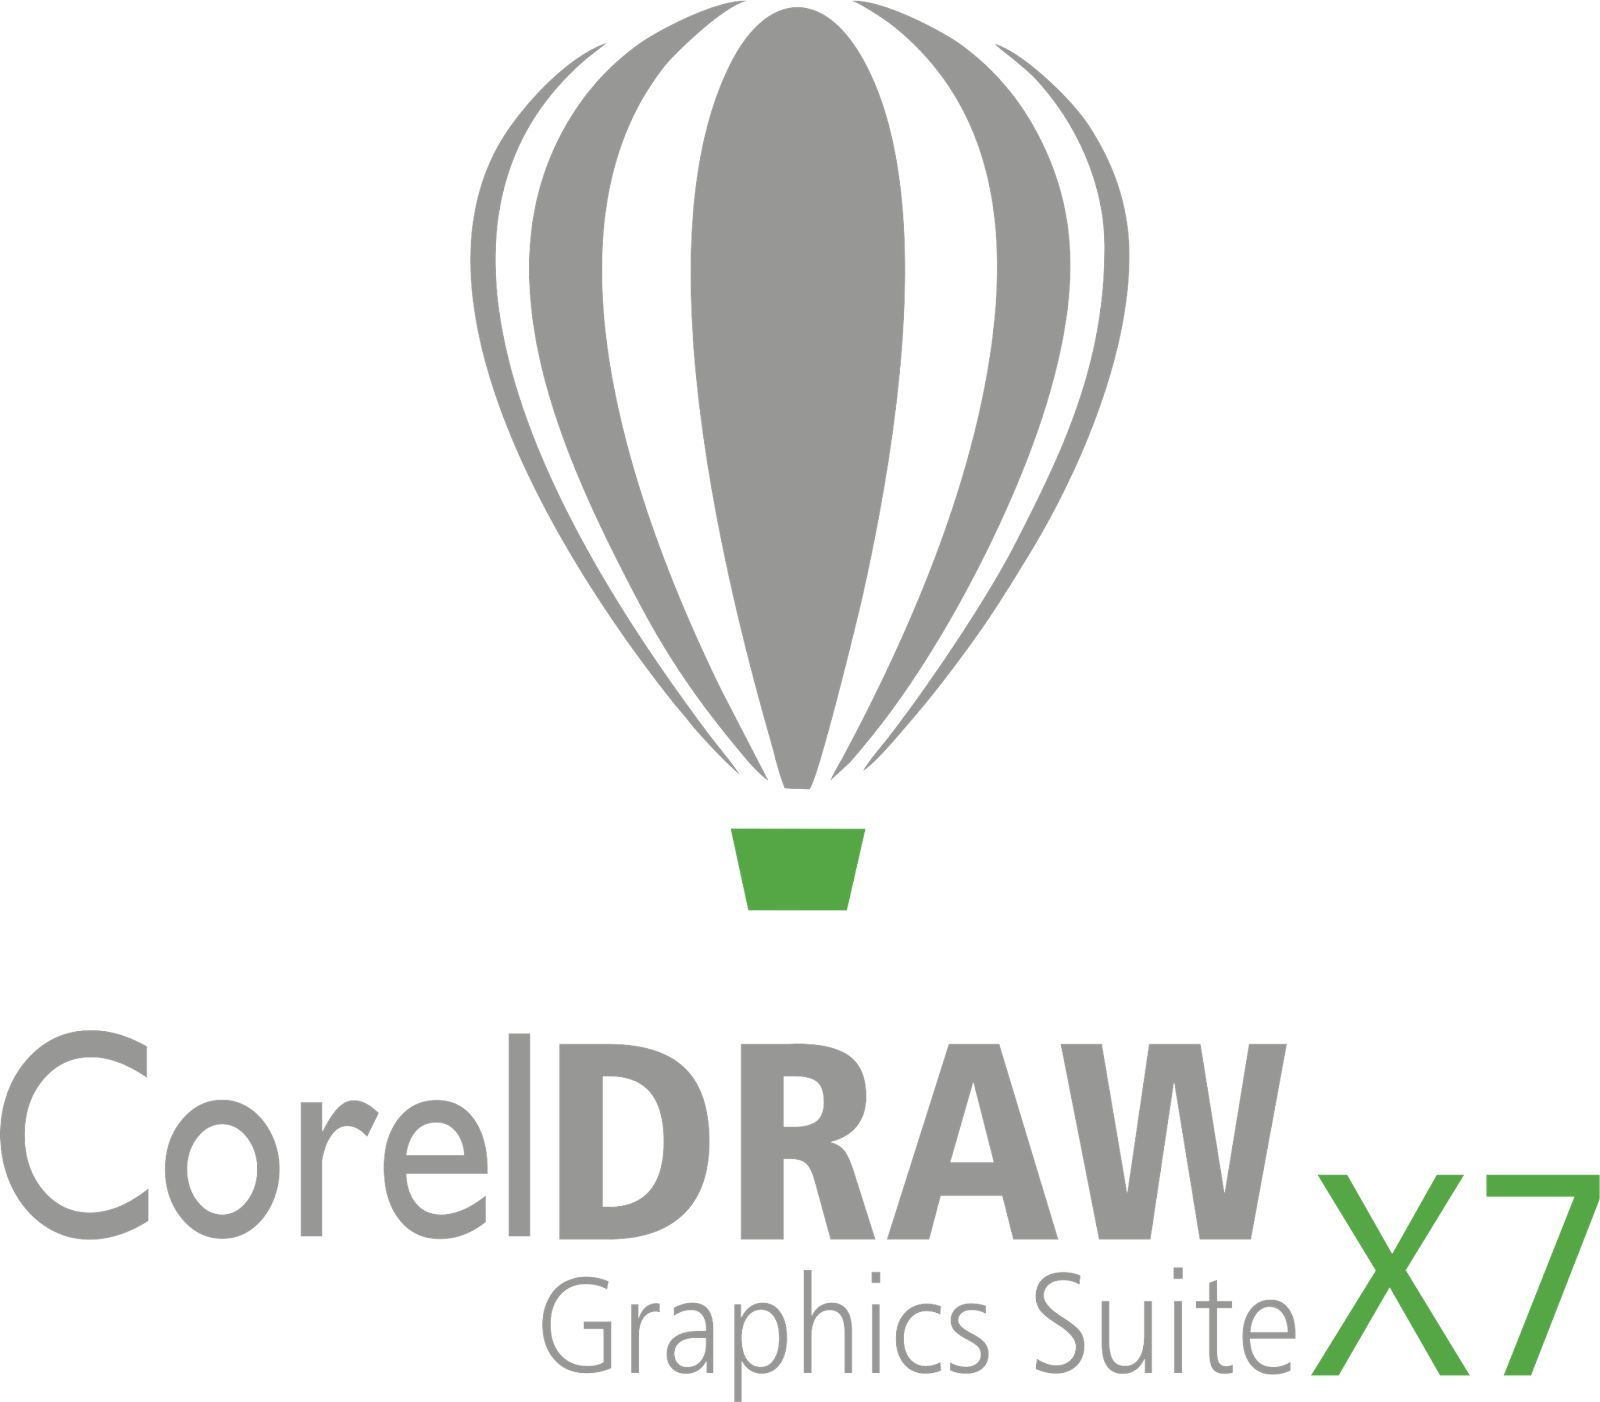 coreldraw graphics suite 2017 serial number free